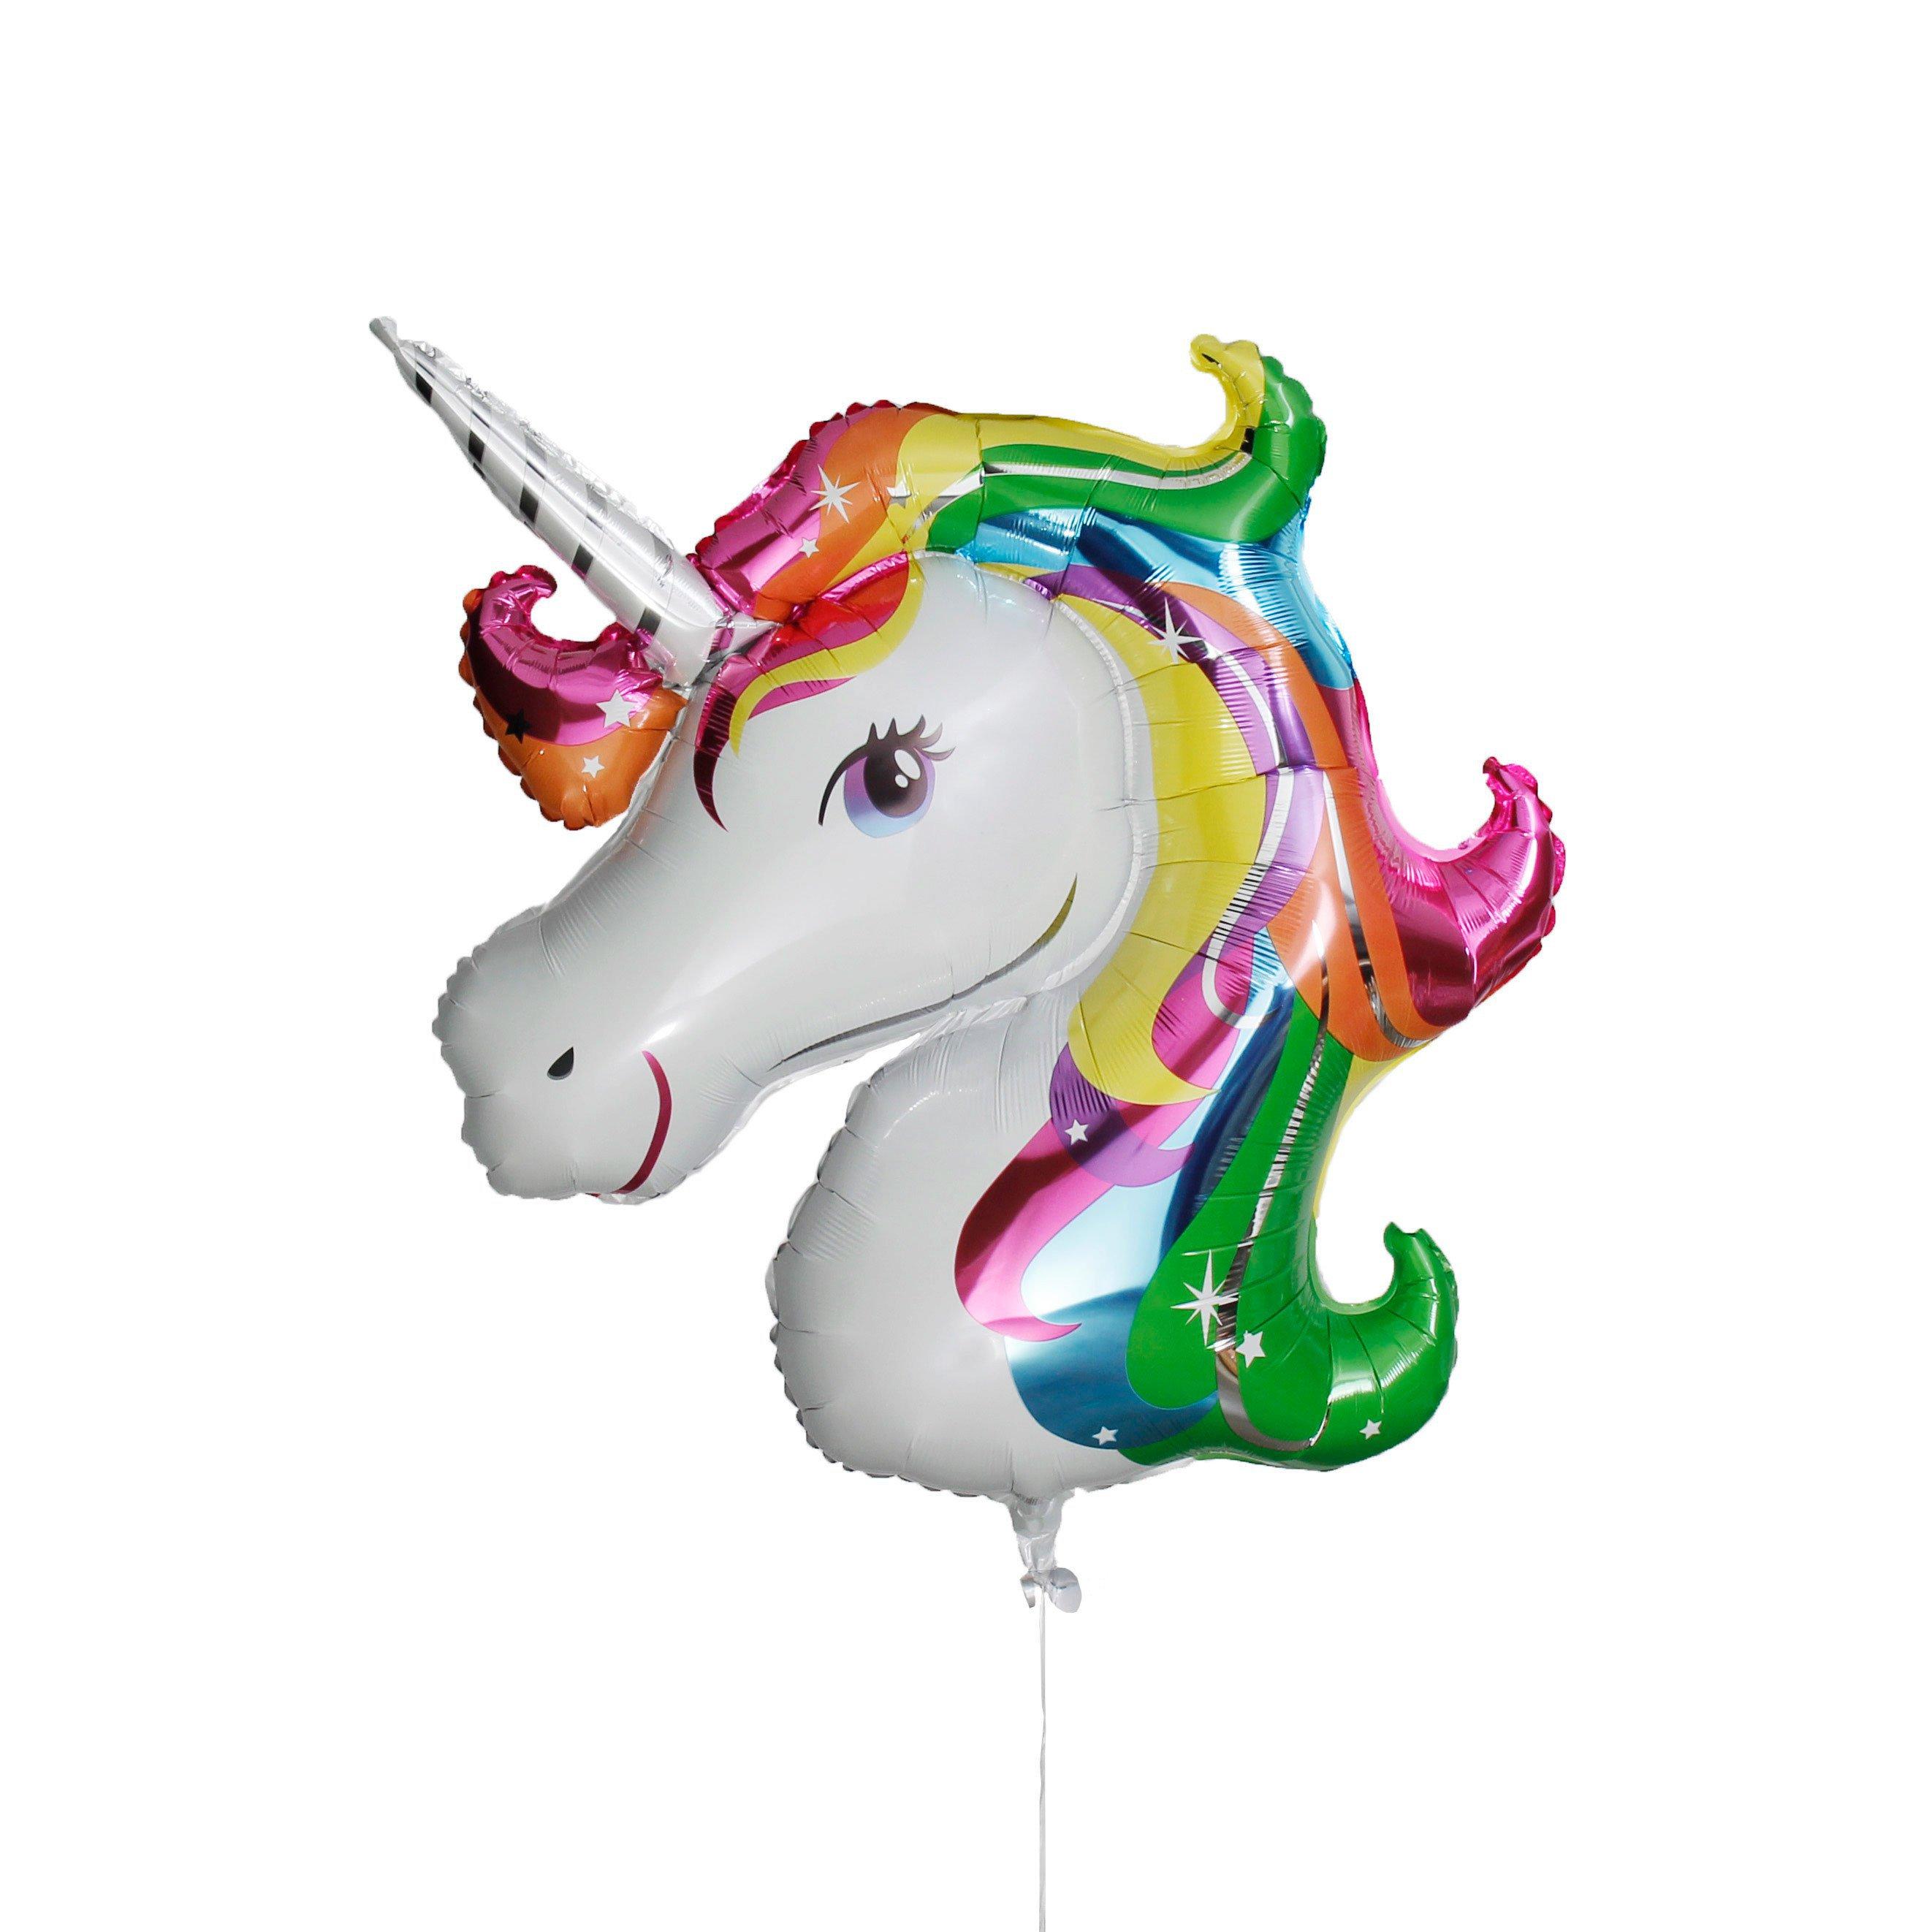 2644x2644 Informative Pictures Of A Unicorn Rainbow Balloon Studio Diy